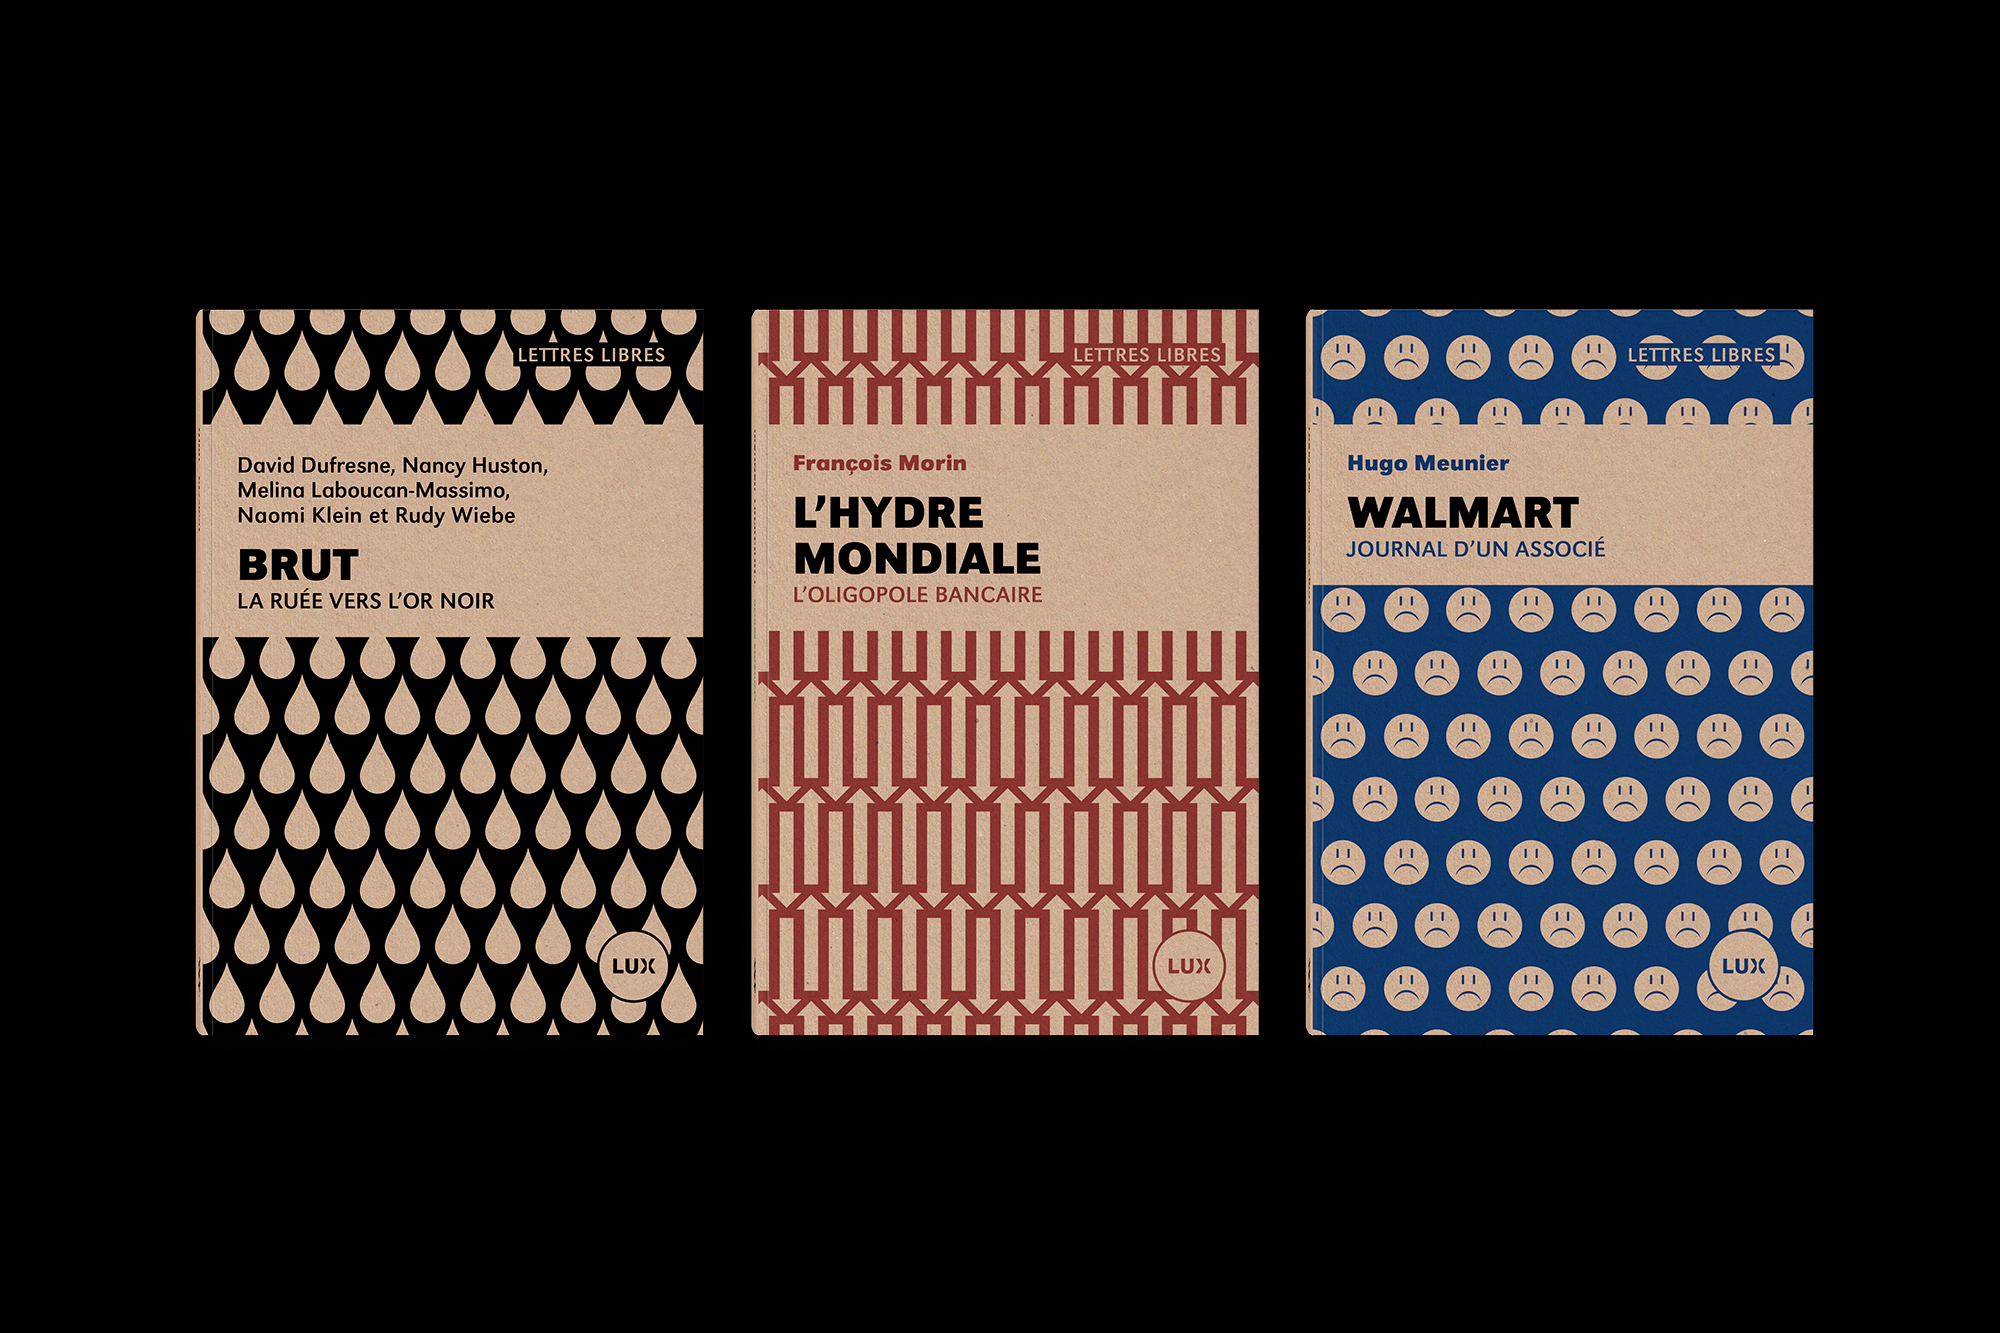 Lettres-libres-mockup-couvertures-1-2-3